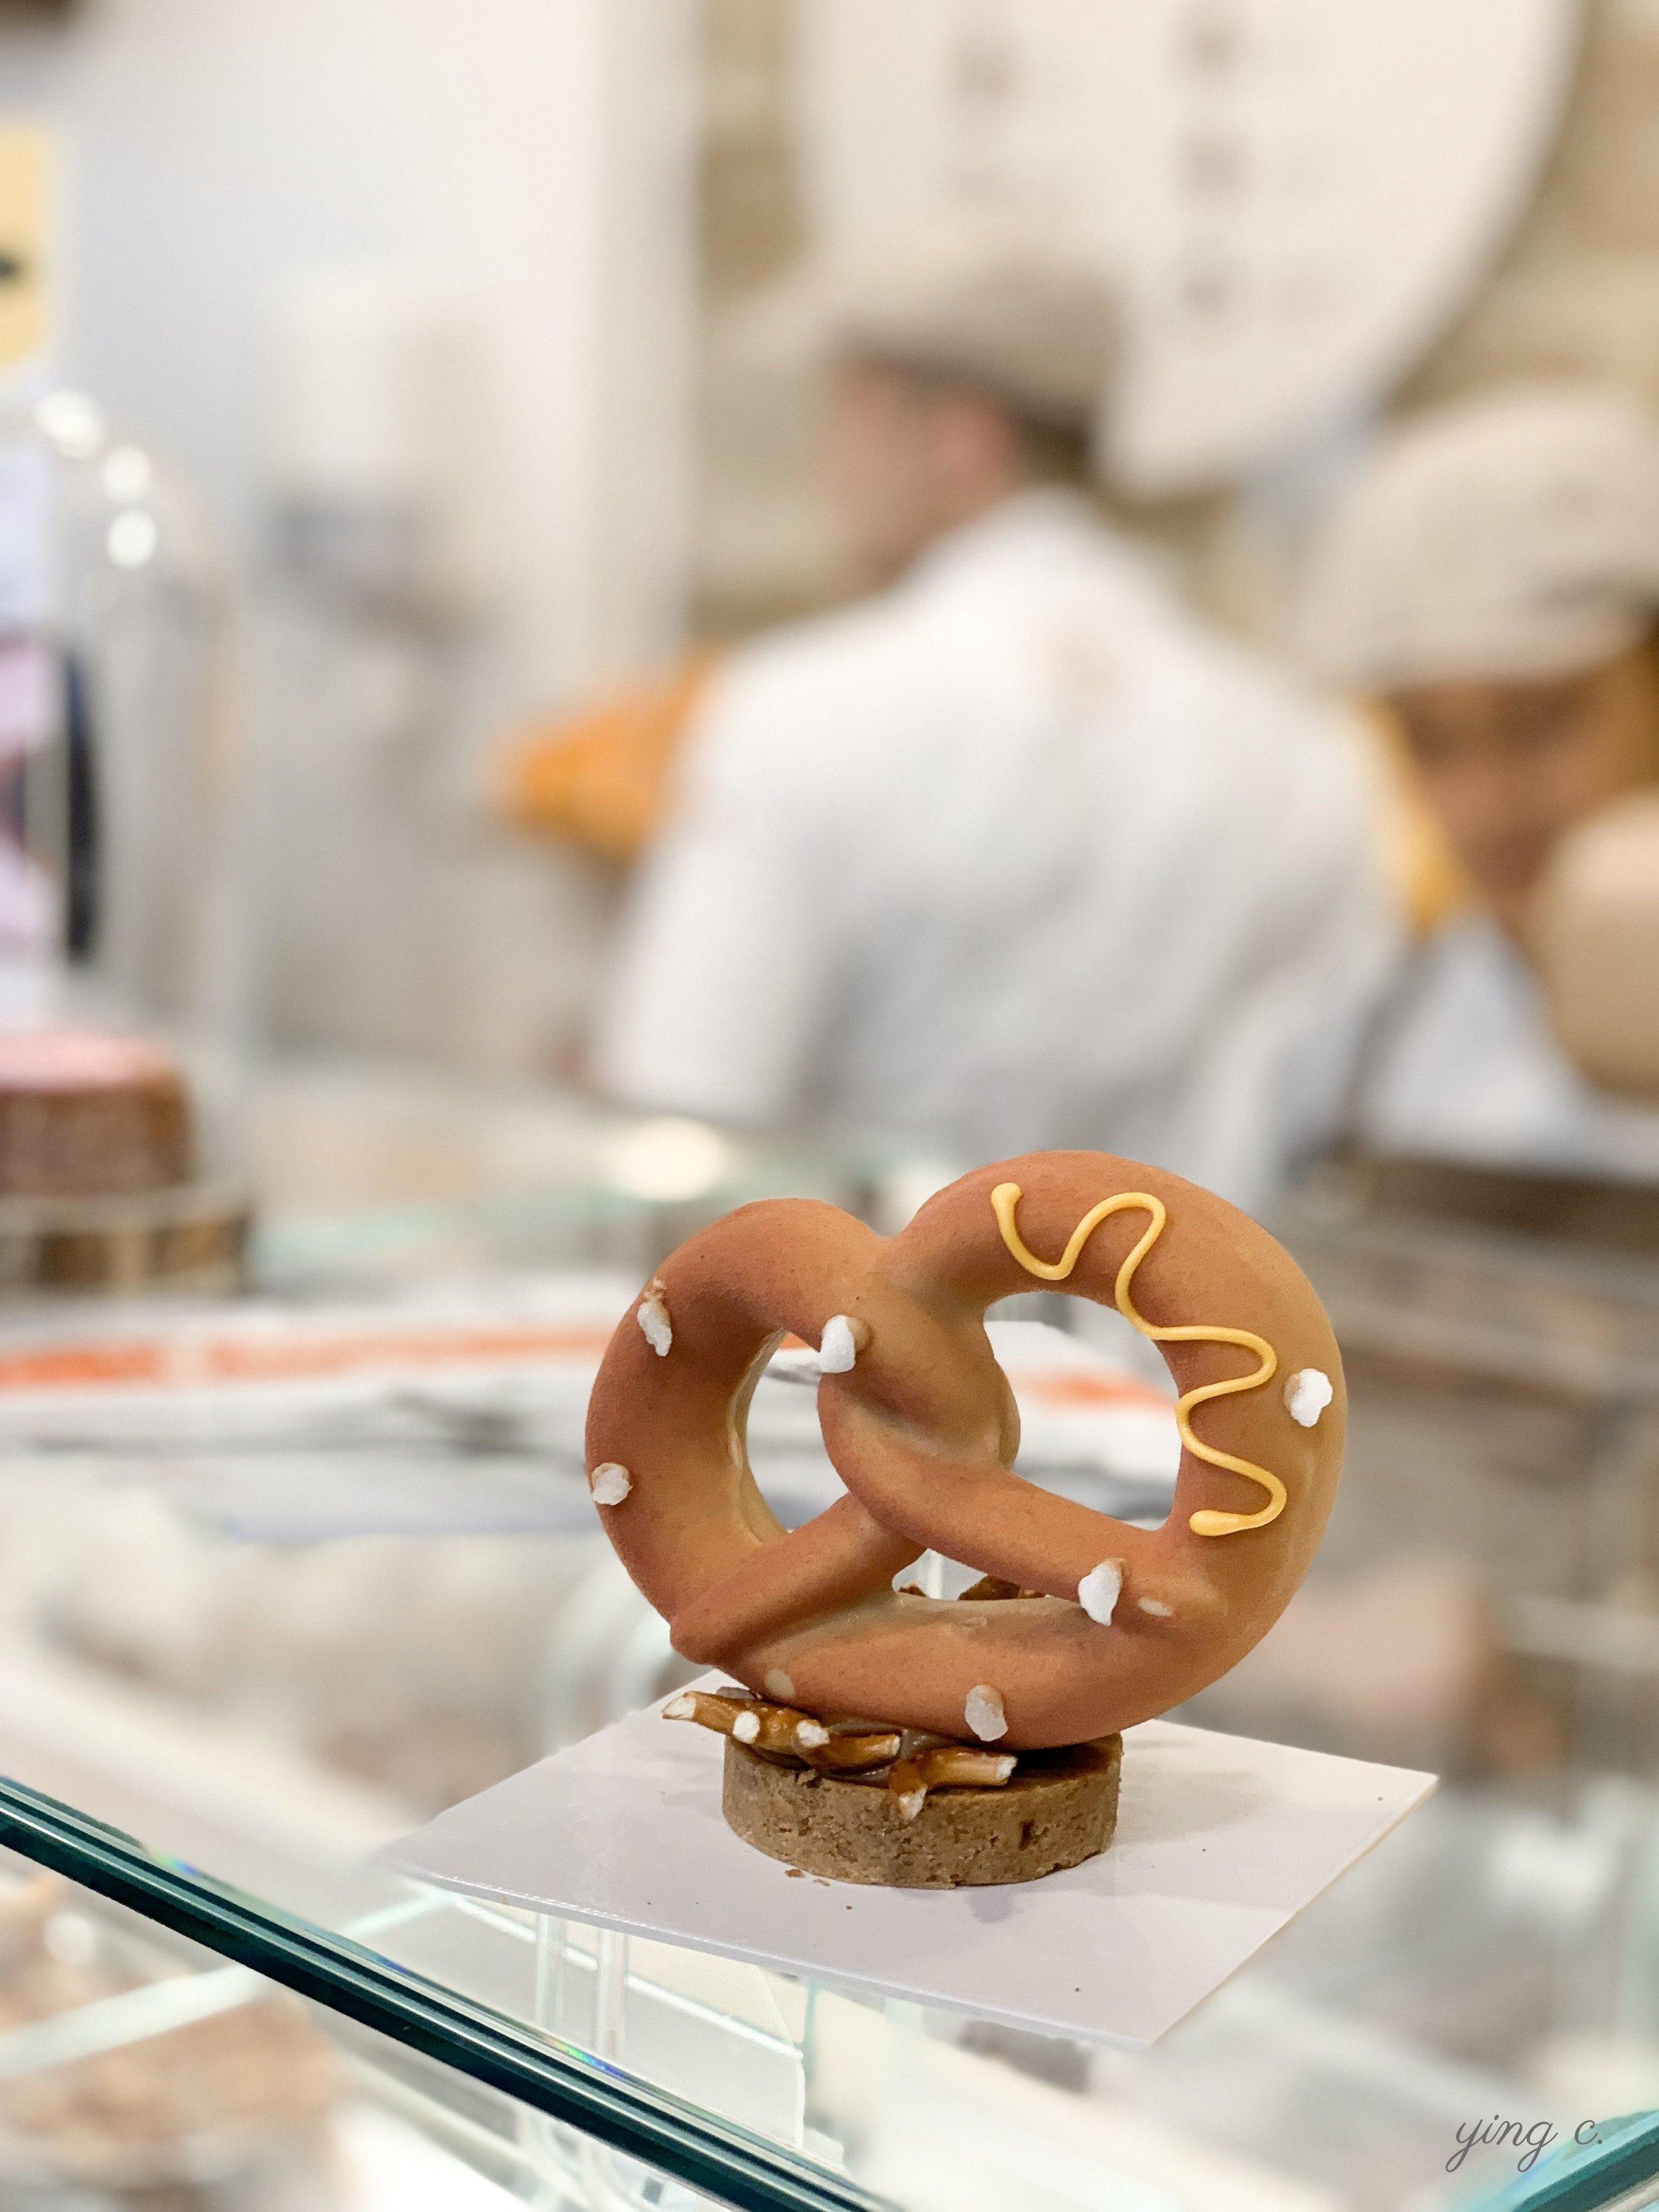 Dominique Ansel 主廚為本次客座活動特別設計的 「Pretzel」德國紐結餅慕斯蛋糕 。